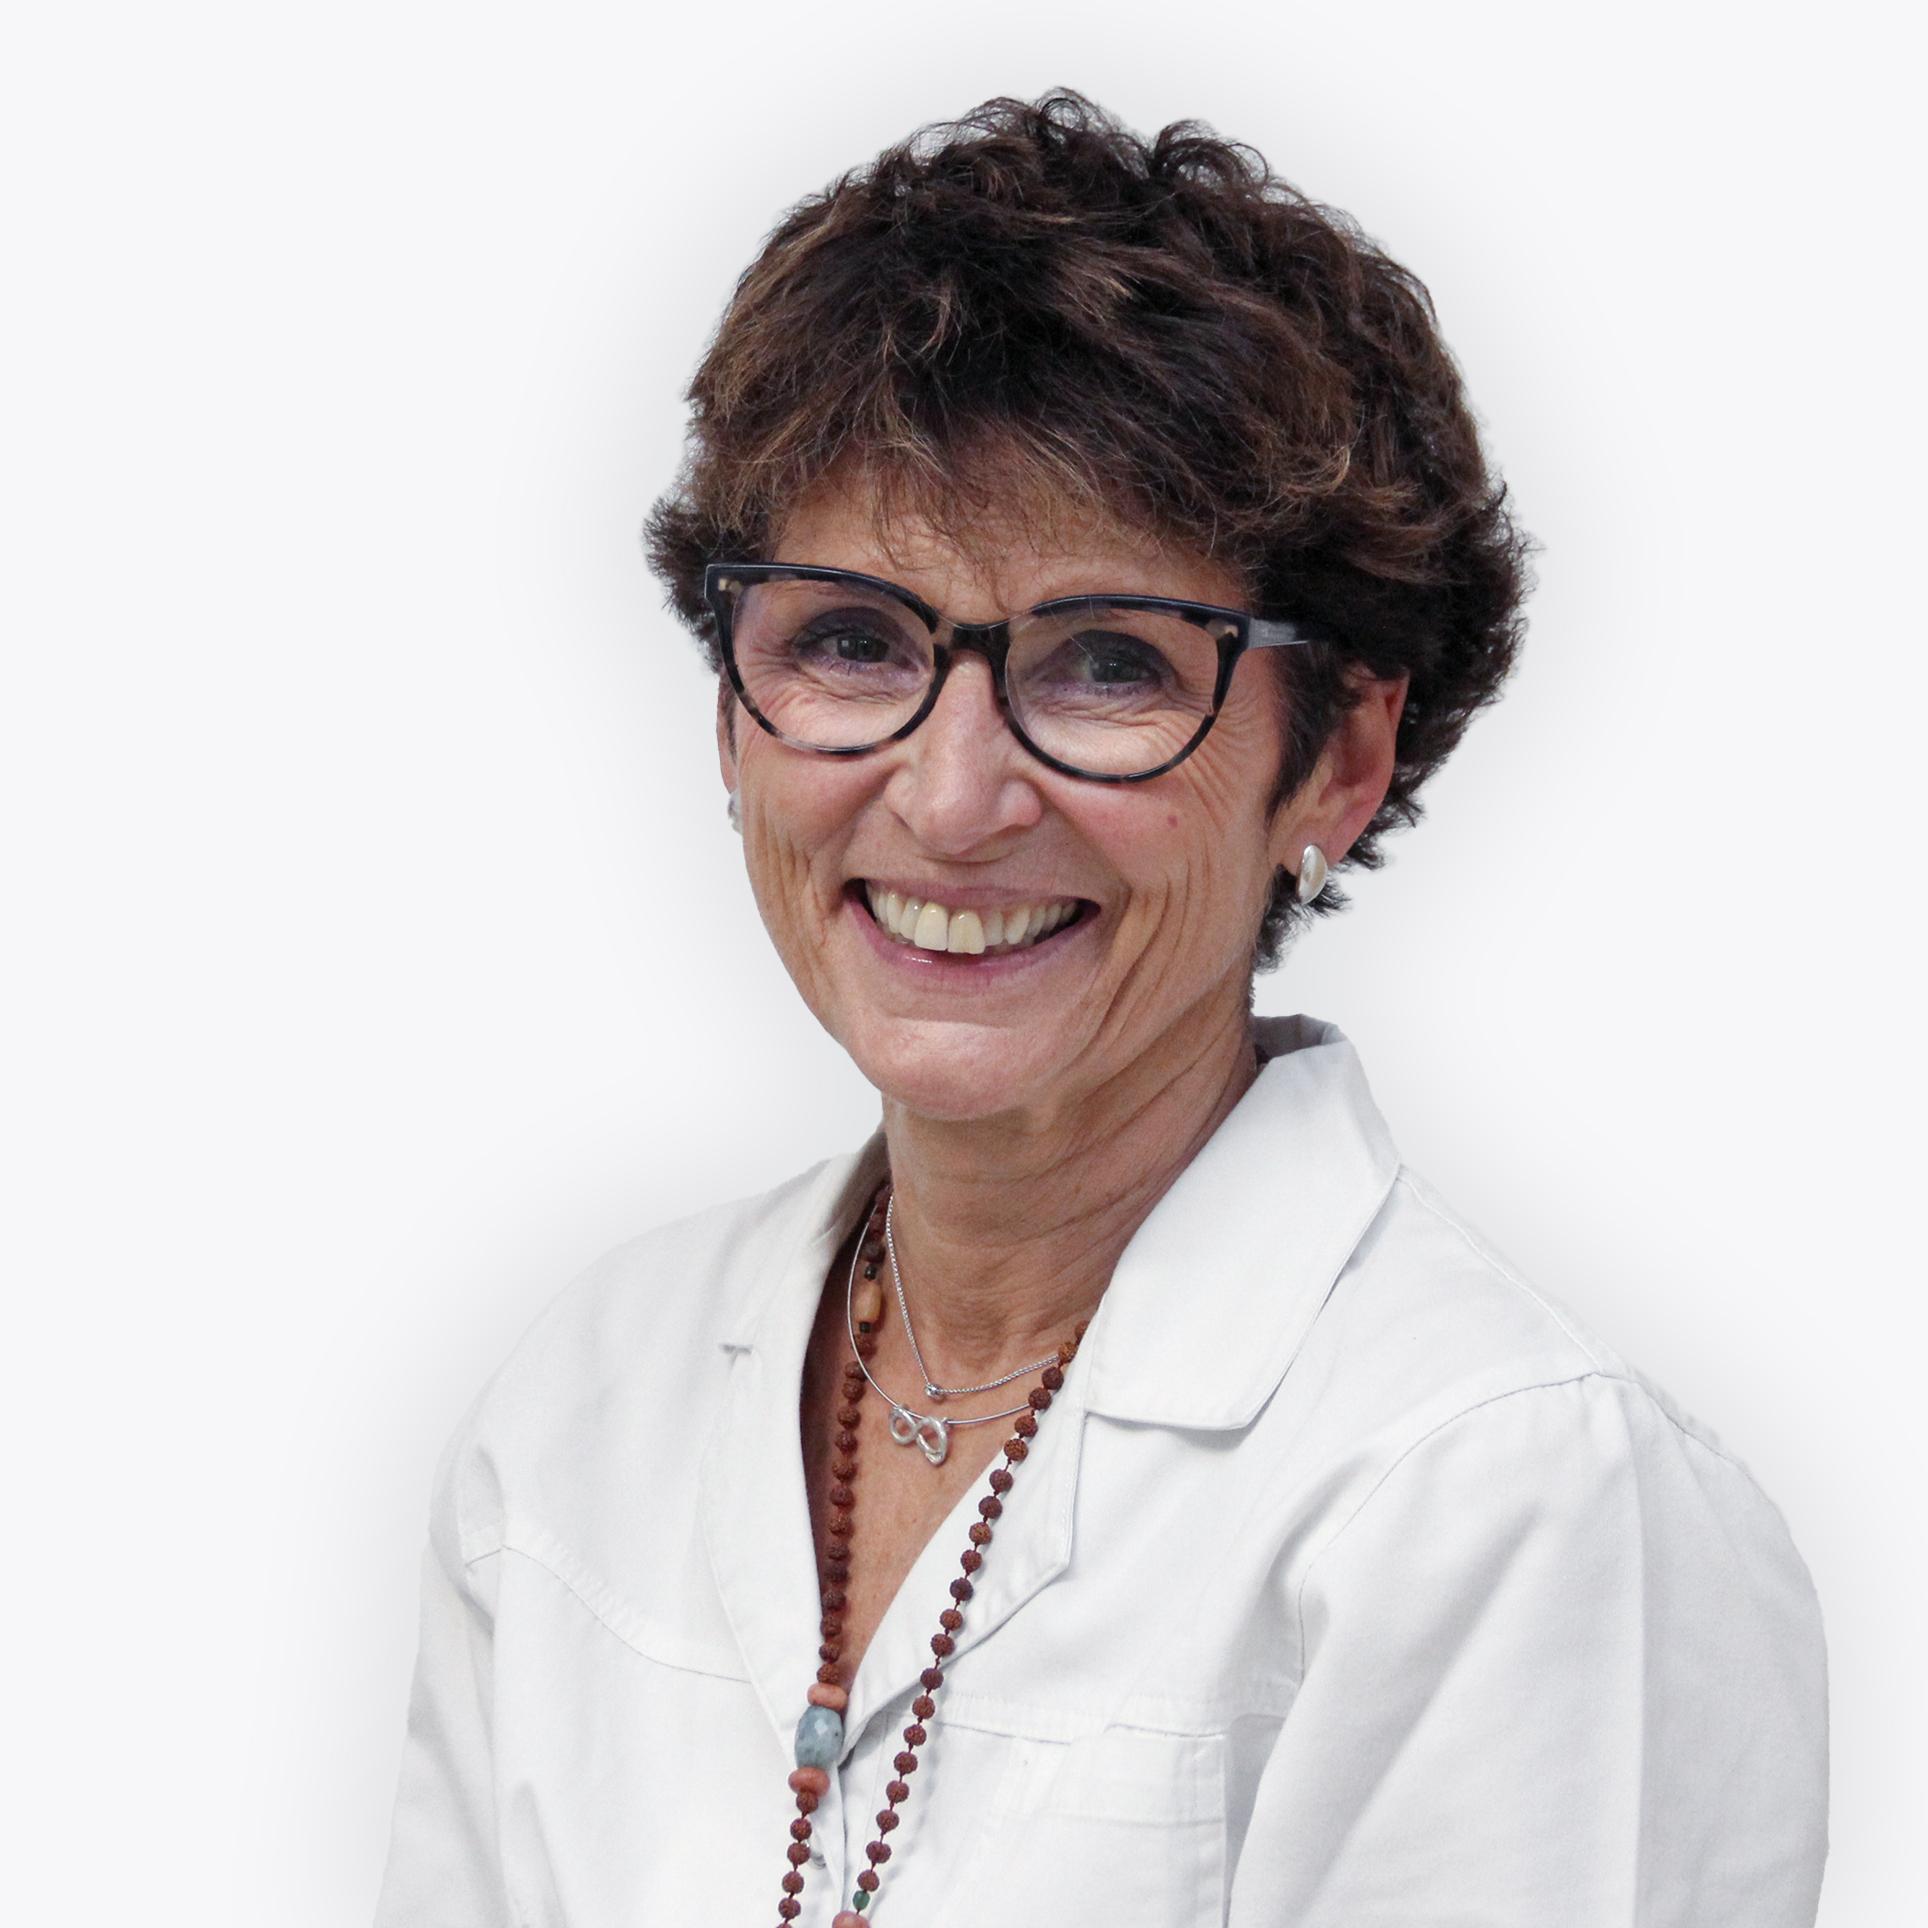 AlessandraLombardi